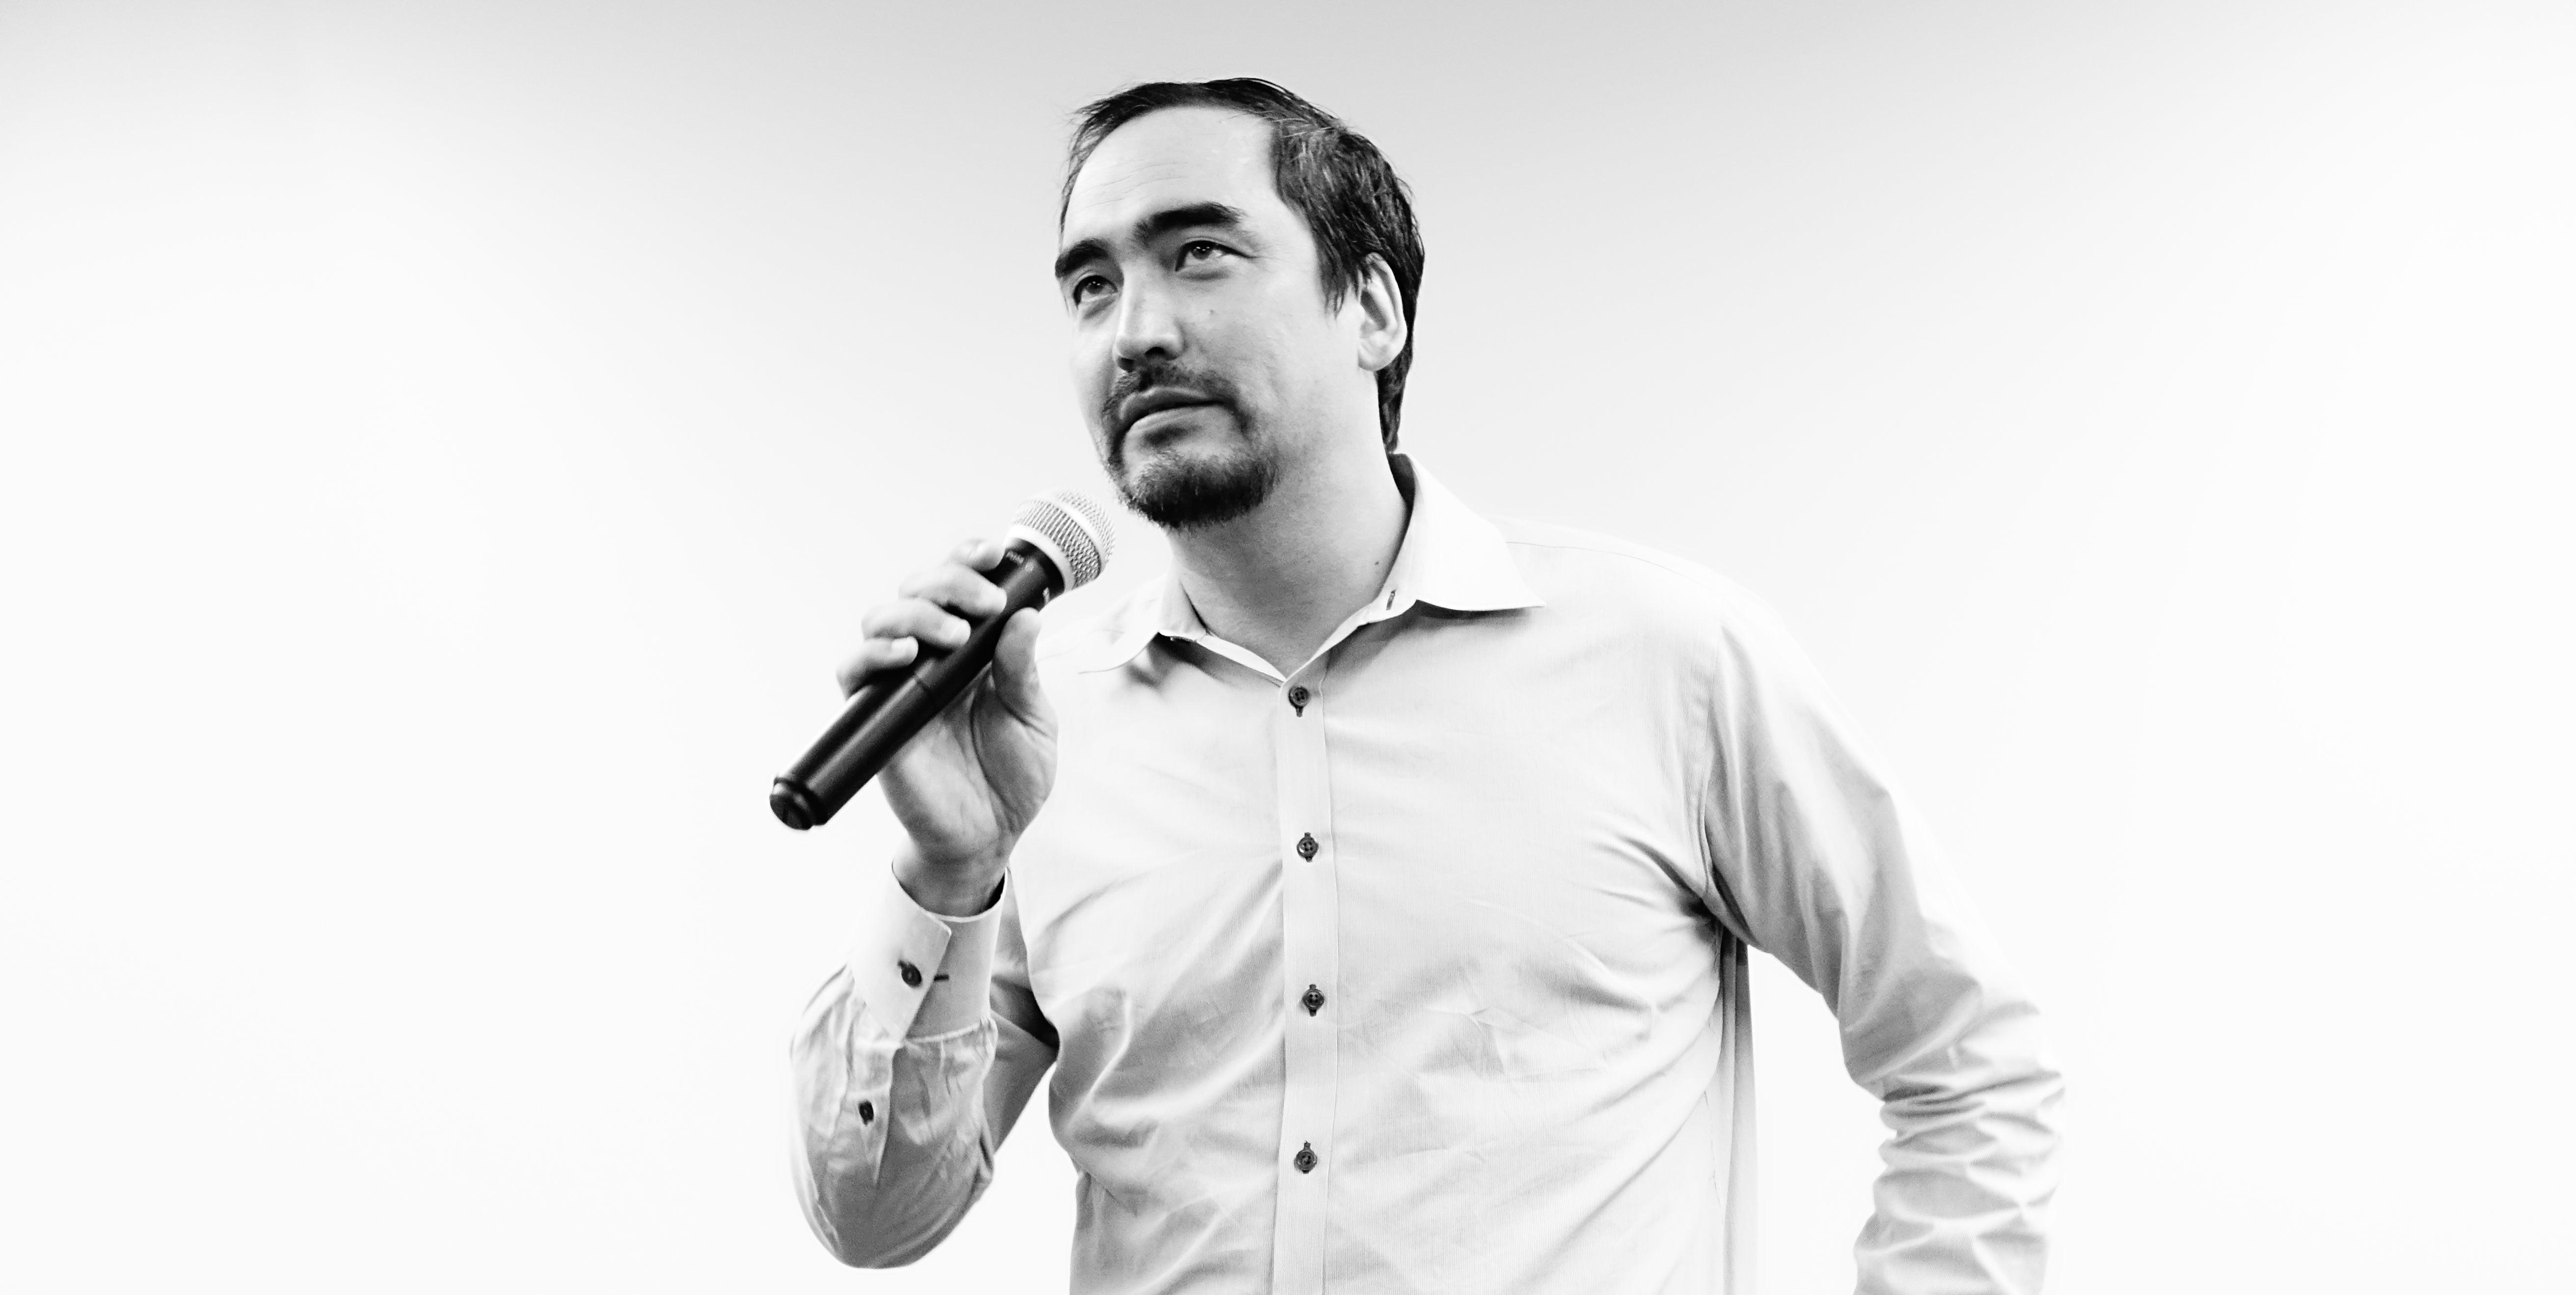 Tim Wu's Already Taking Down Big Broadband Companies in New York